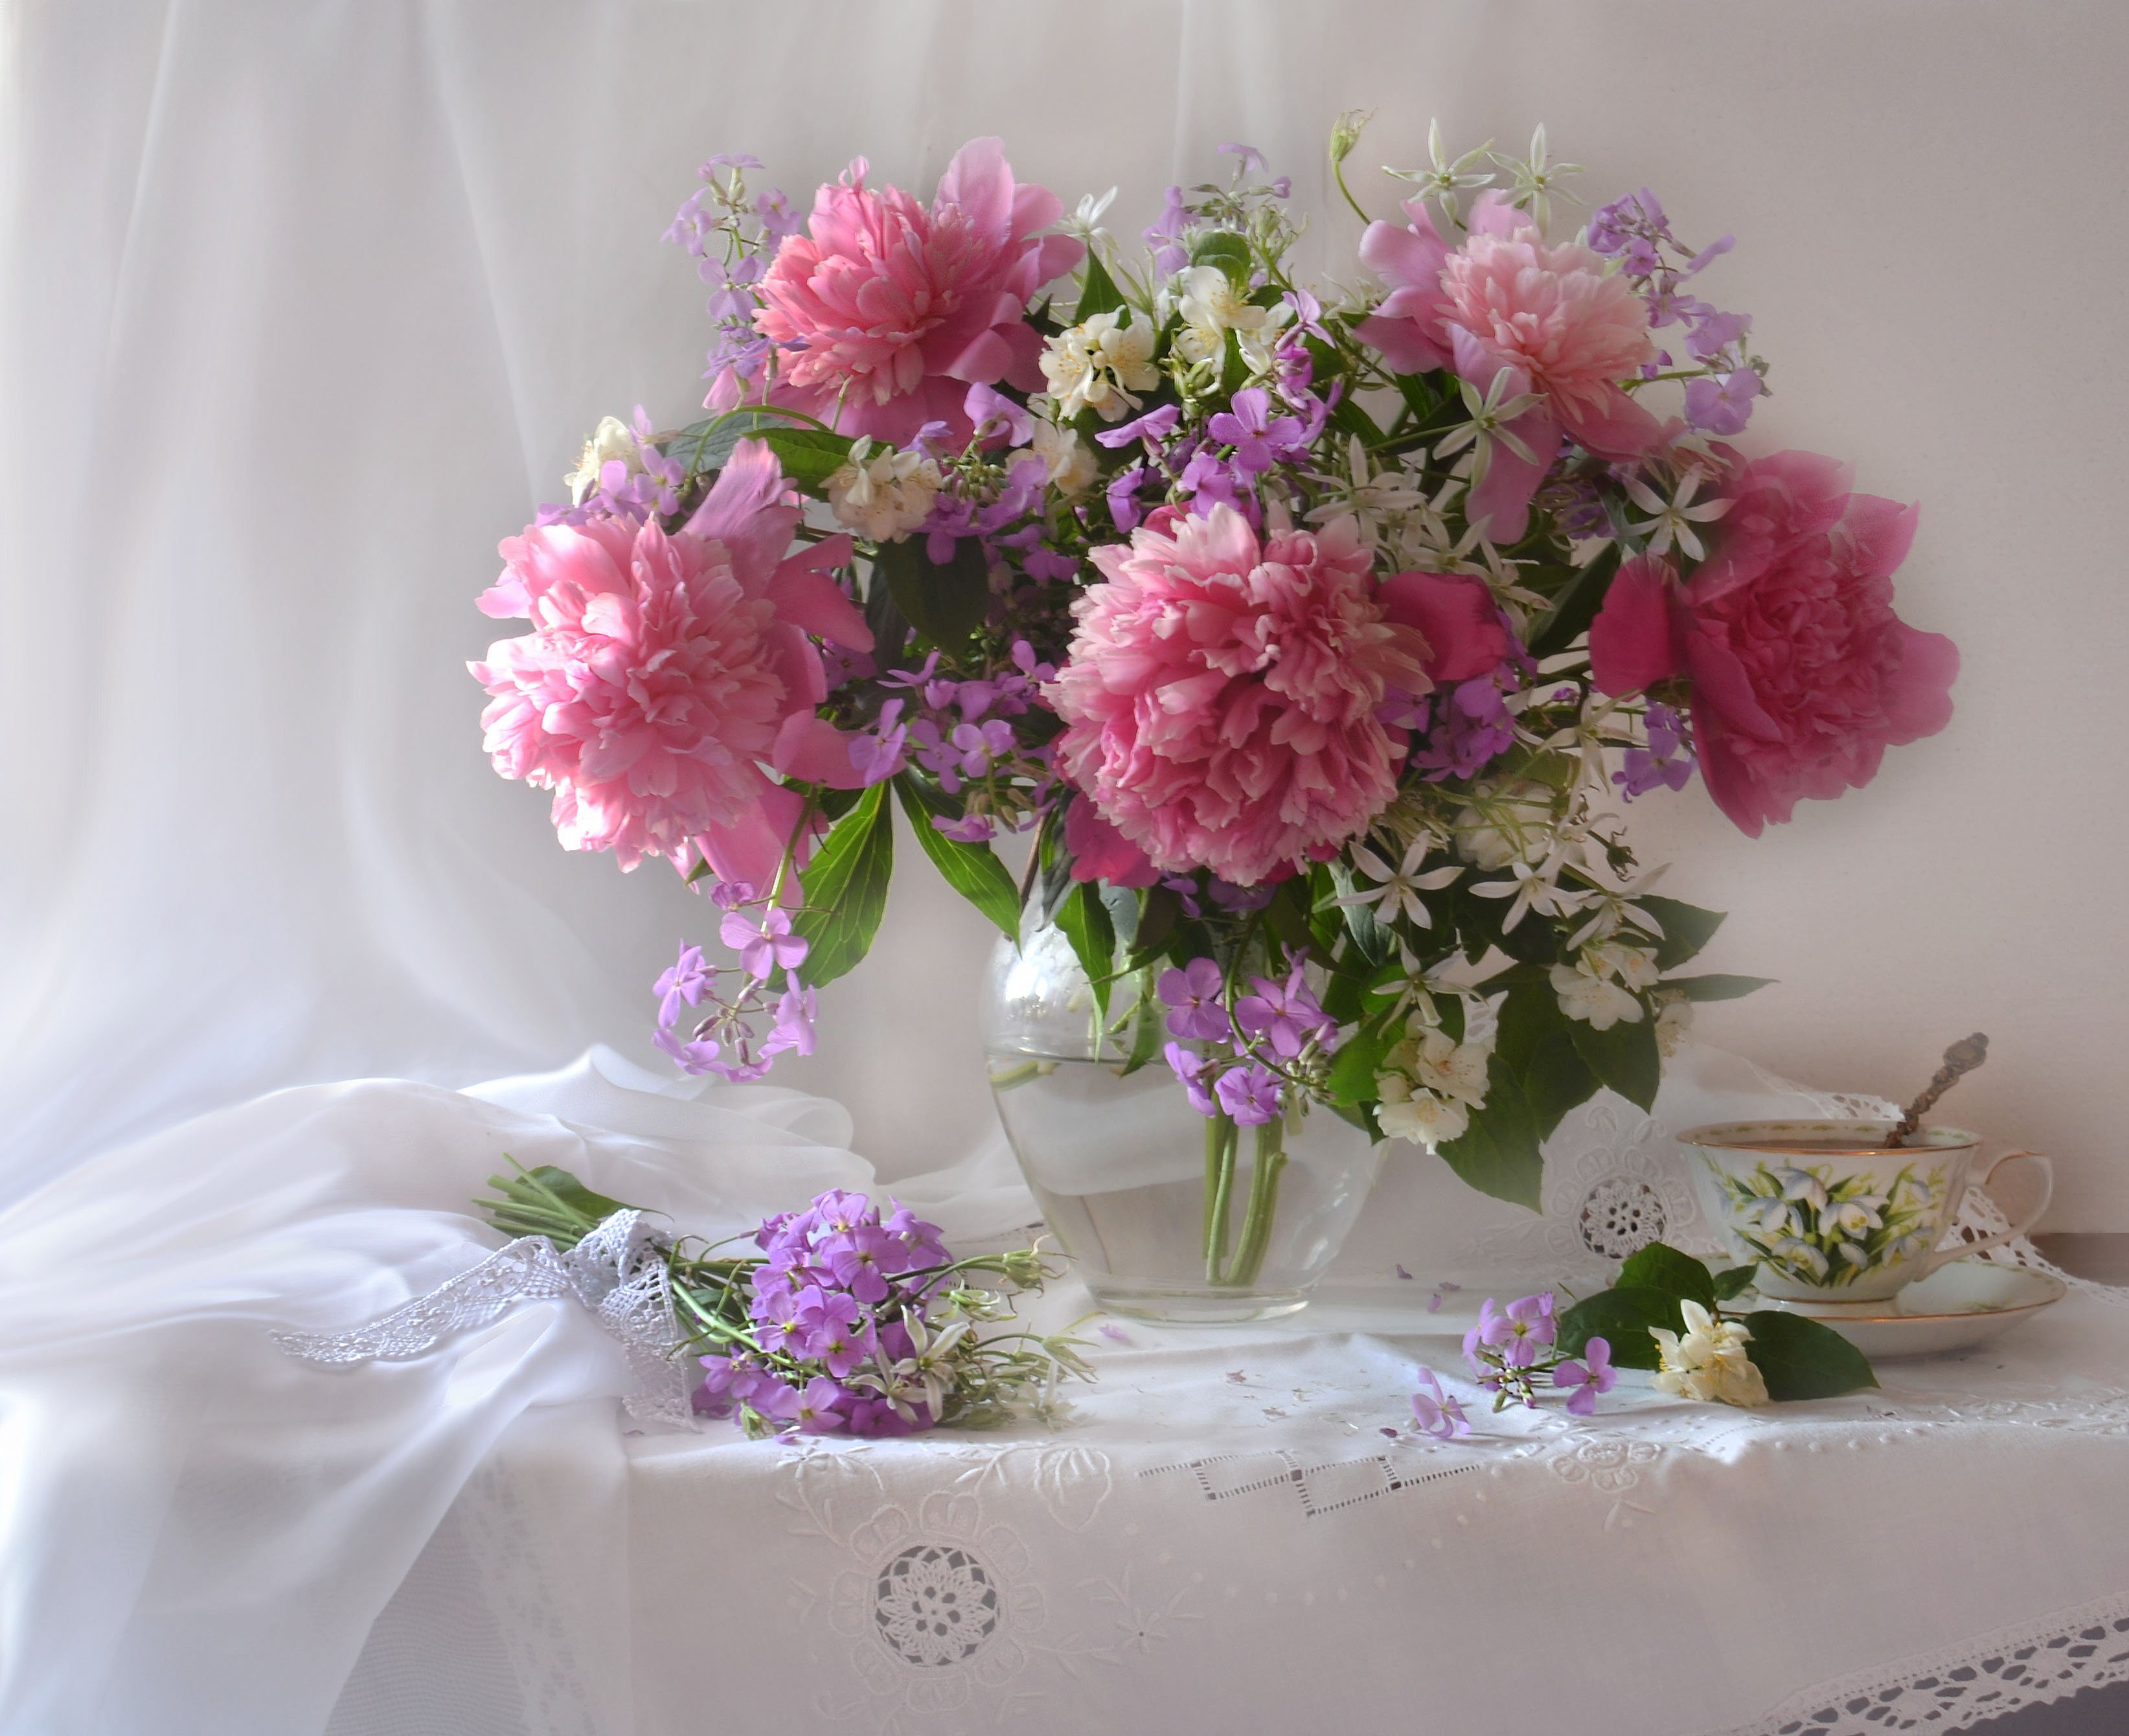 still life, натюрморт,  лето, птицемлечник, розовые пионы, вечерний  чай, фарфор, фиалки, фото натюрморт, цветы, жасмин,, Колова Валентина